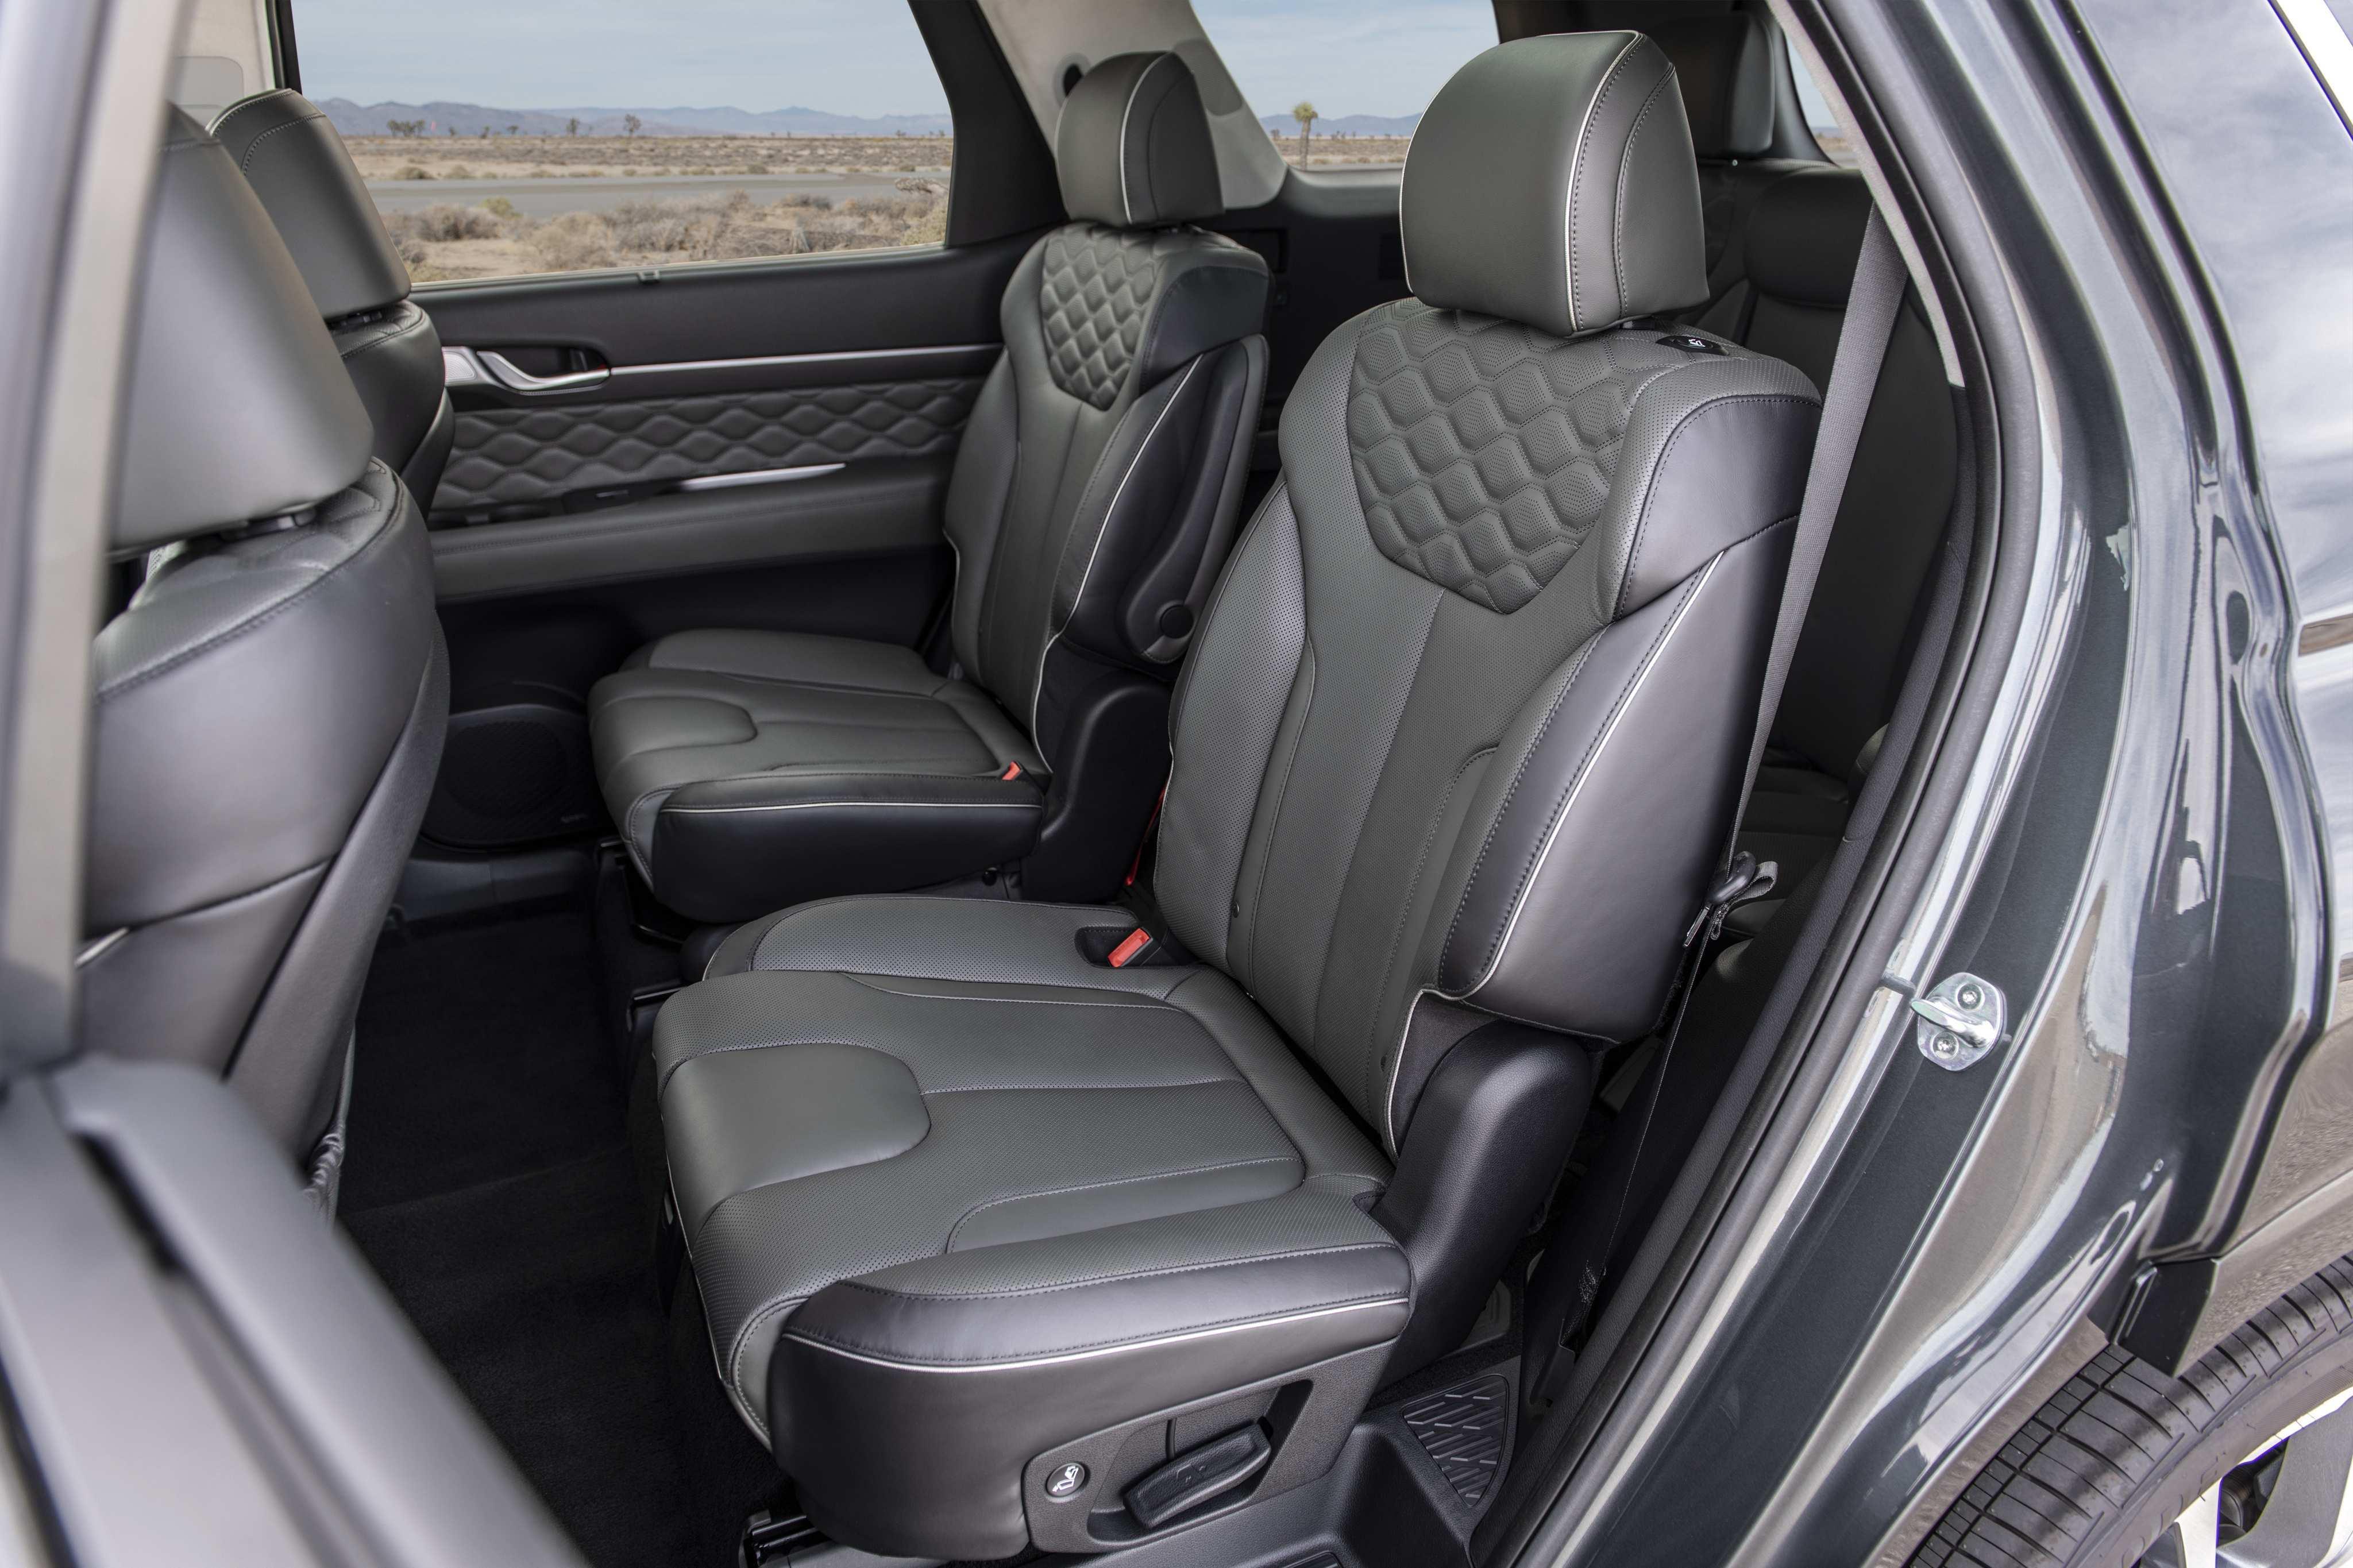 44 Best Review Hyundai Palisade 2020 Interior Images for Hyundai Palisade 2020 Interior